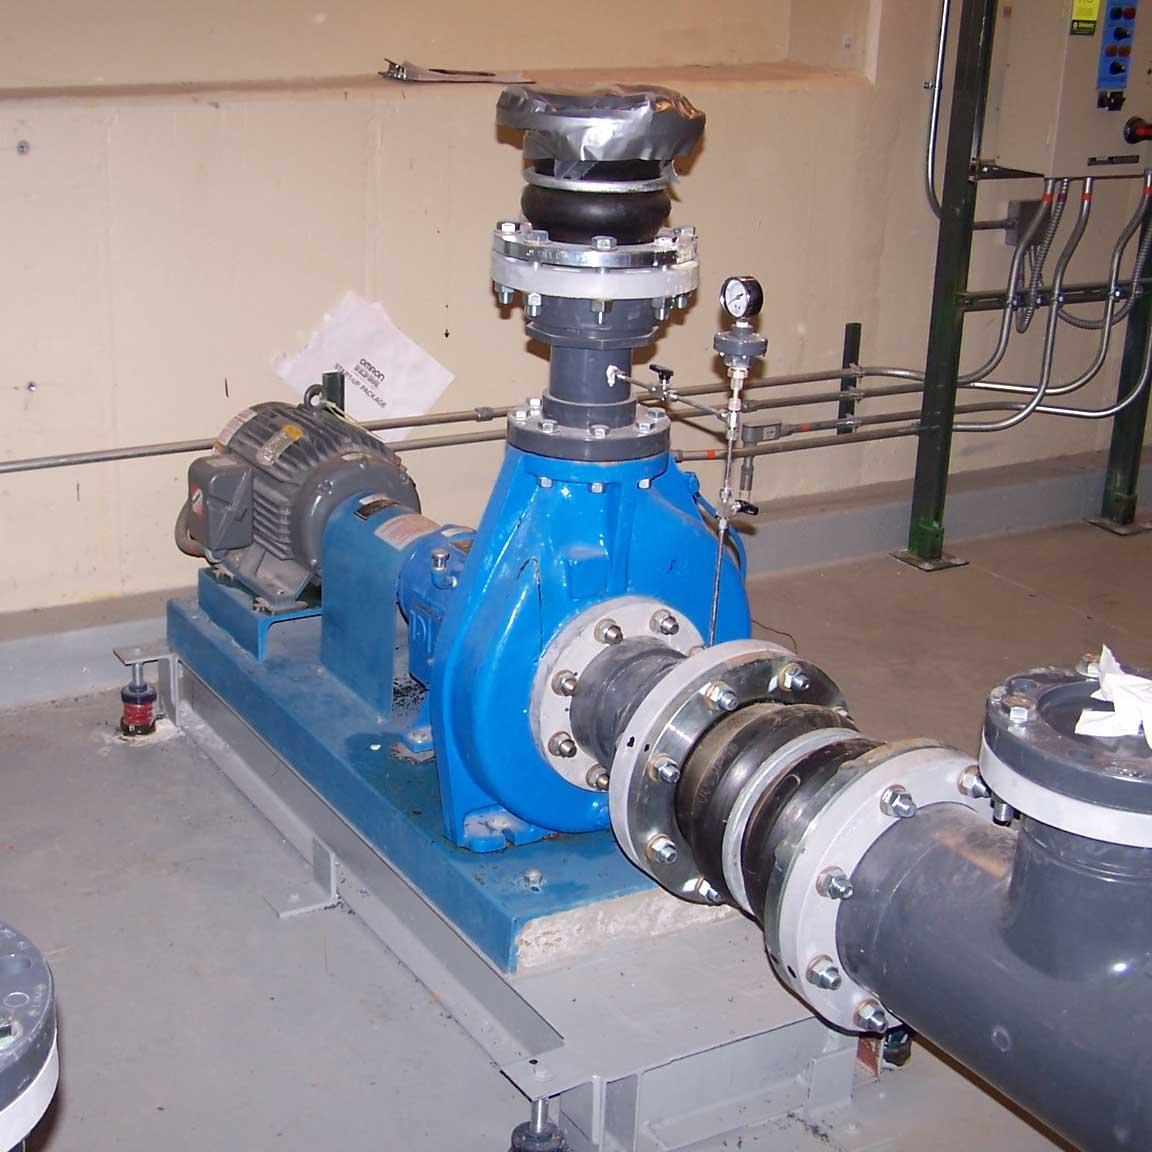 Ingersoll Dresser Grp Centrifugal Liquid Pump System 6 X 4 10 7 5 Hp Motor Rebuilt